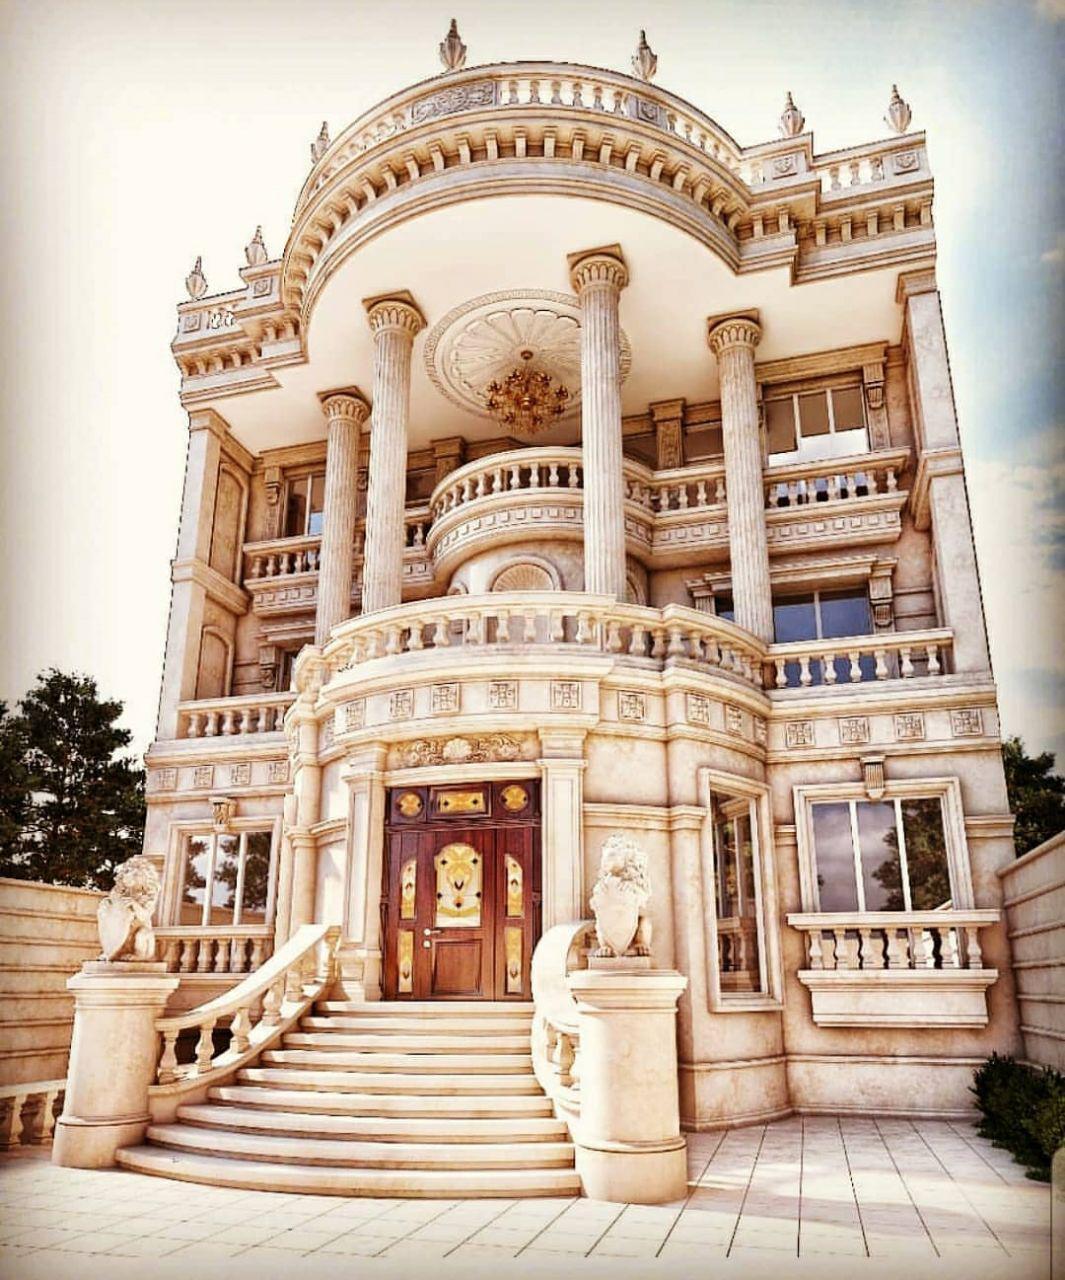 کاربرد سنگ در معماری کلاسیک